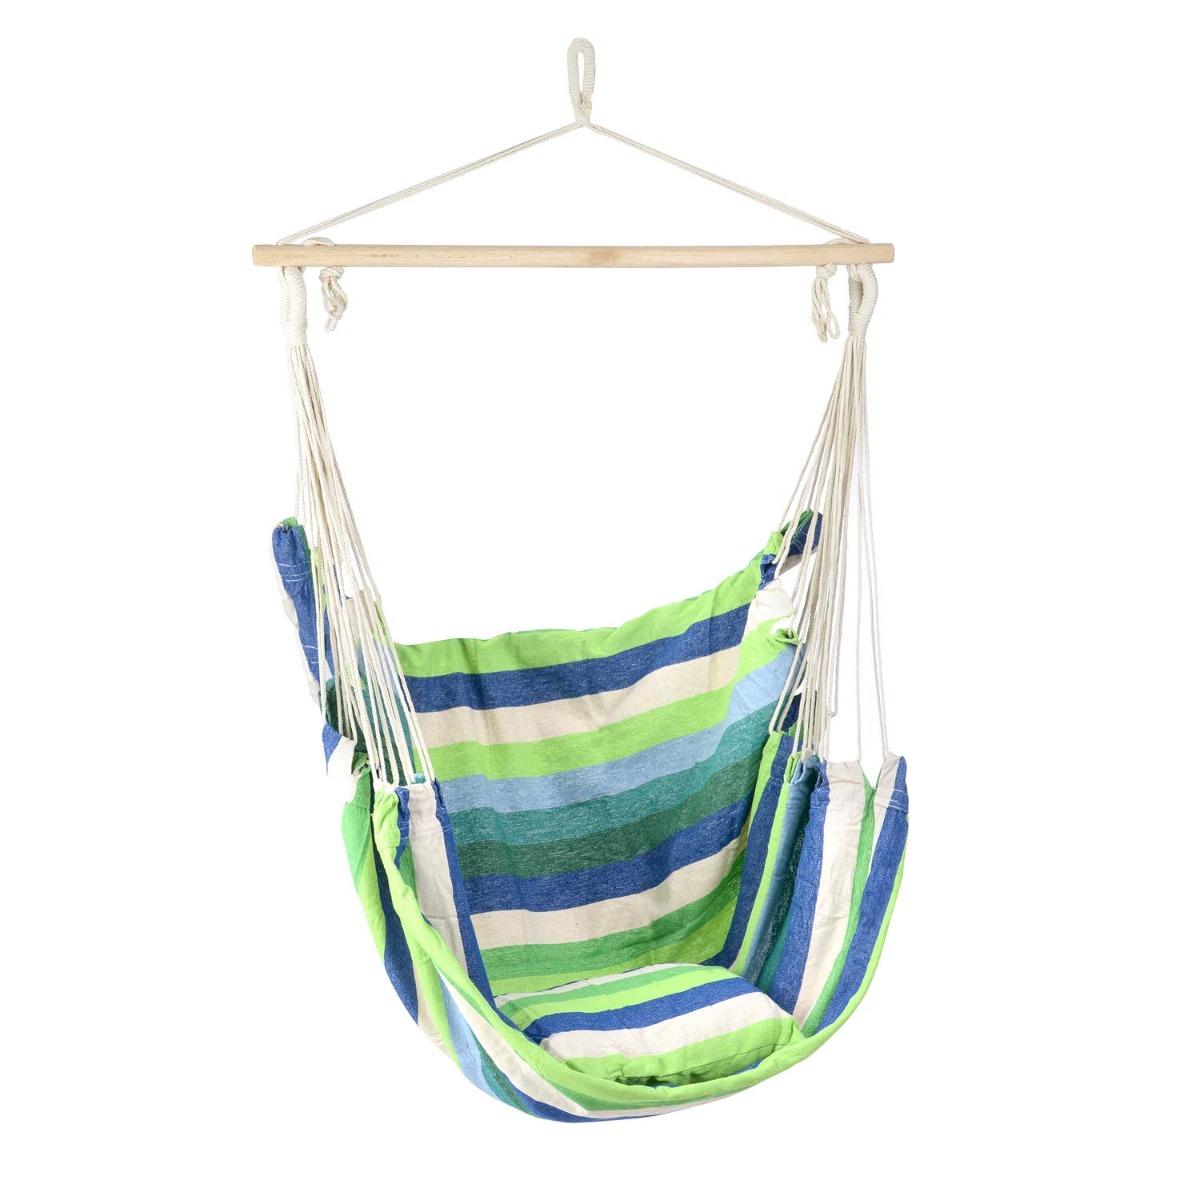 Image of Hanging Hammock Swing Chair